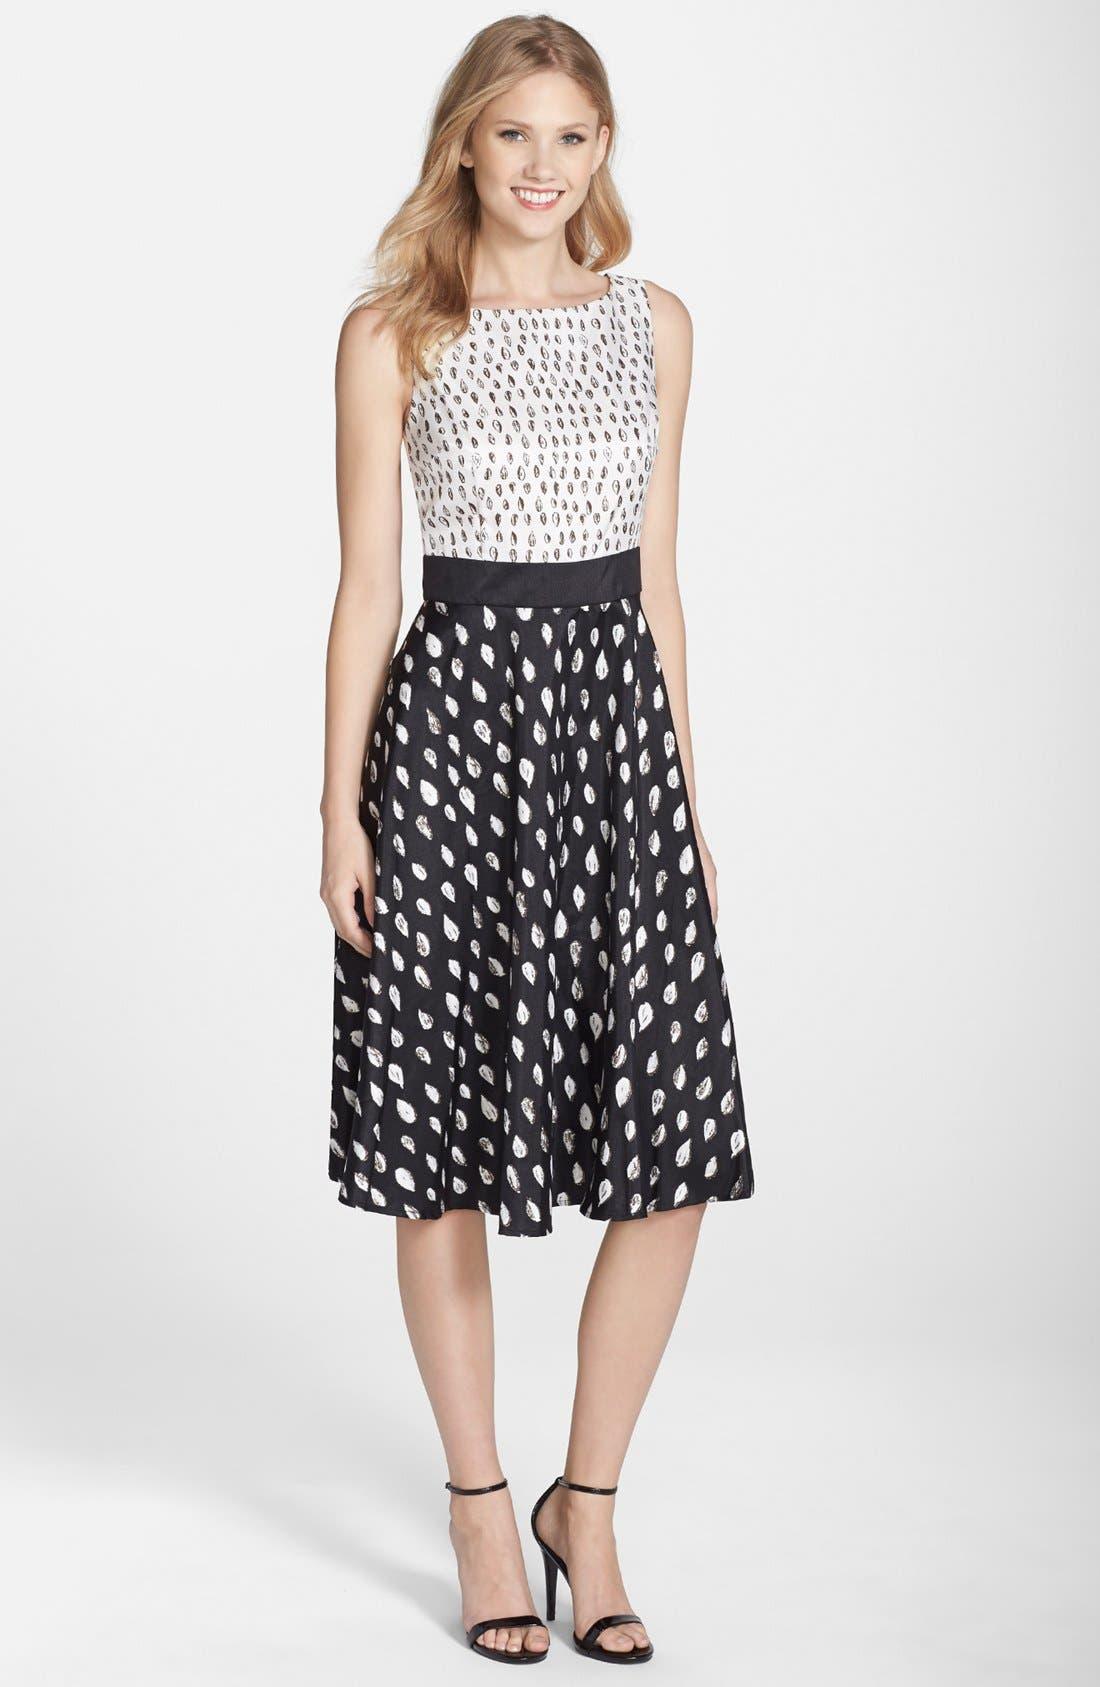 Main Image - Gabby Skye Print Shantung Fit & Flare Dress